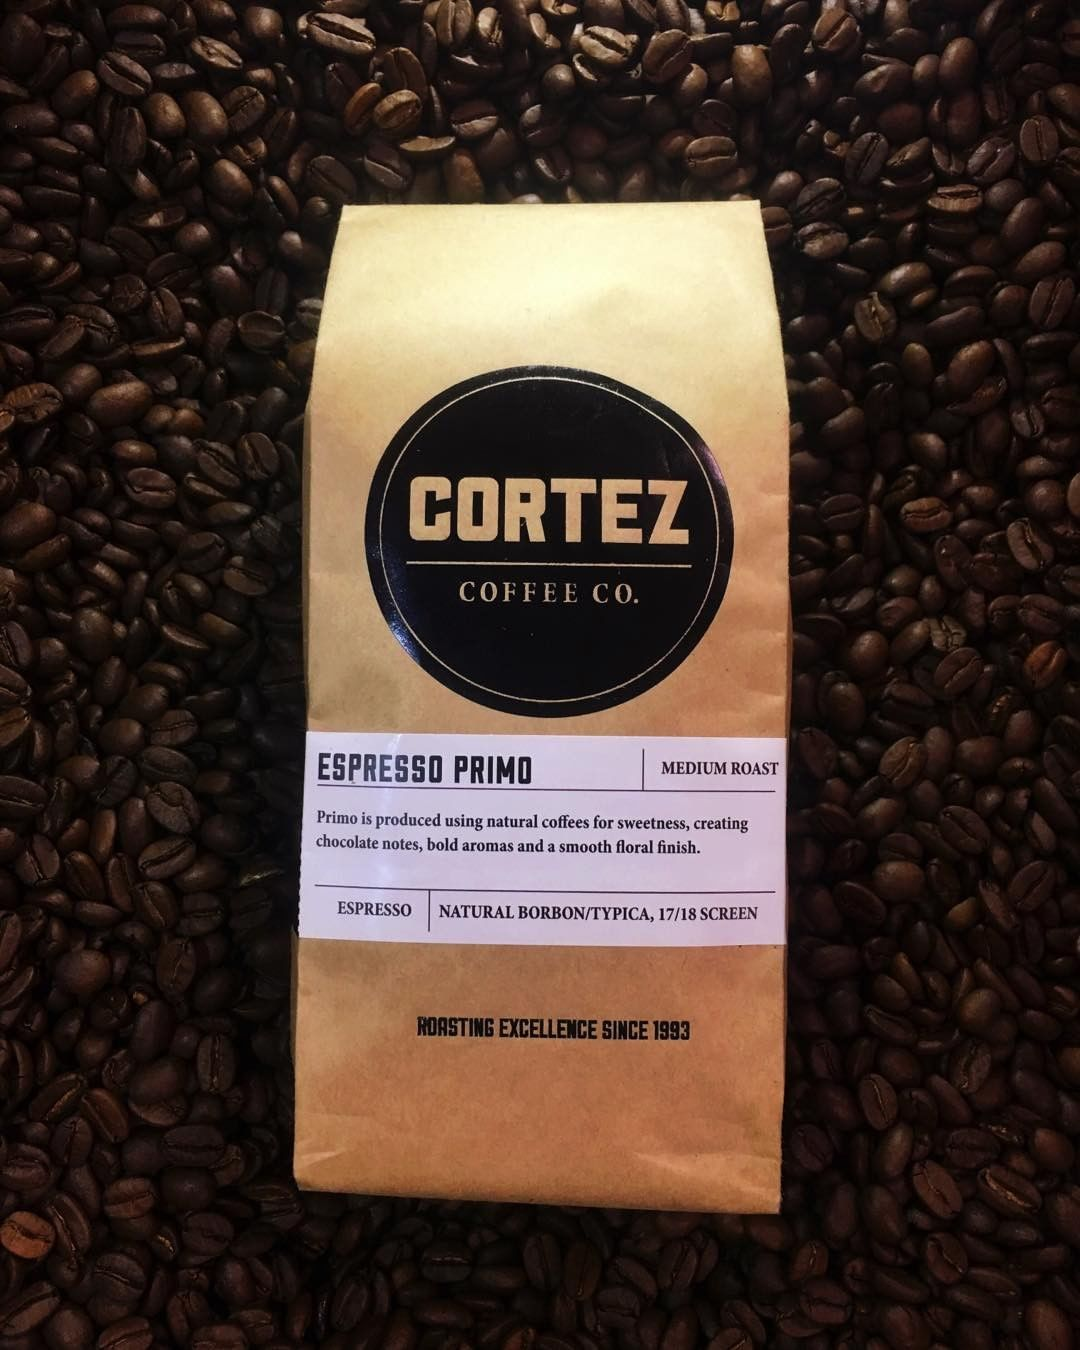 Photo Credit: Cortez Coffee, Instagram @cortezcoffeeco